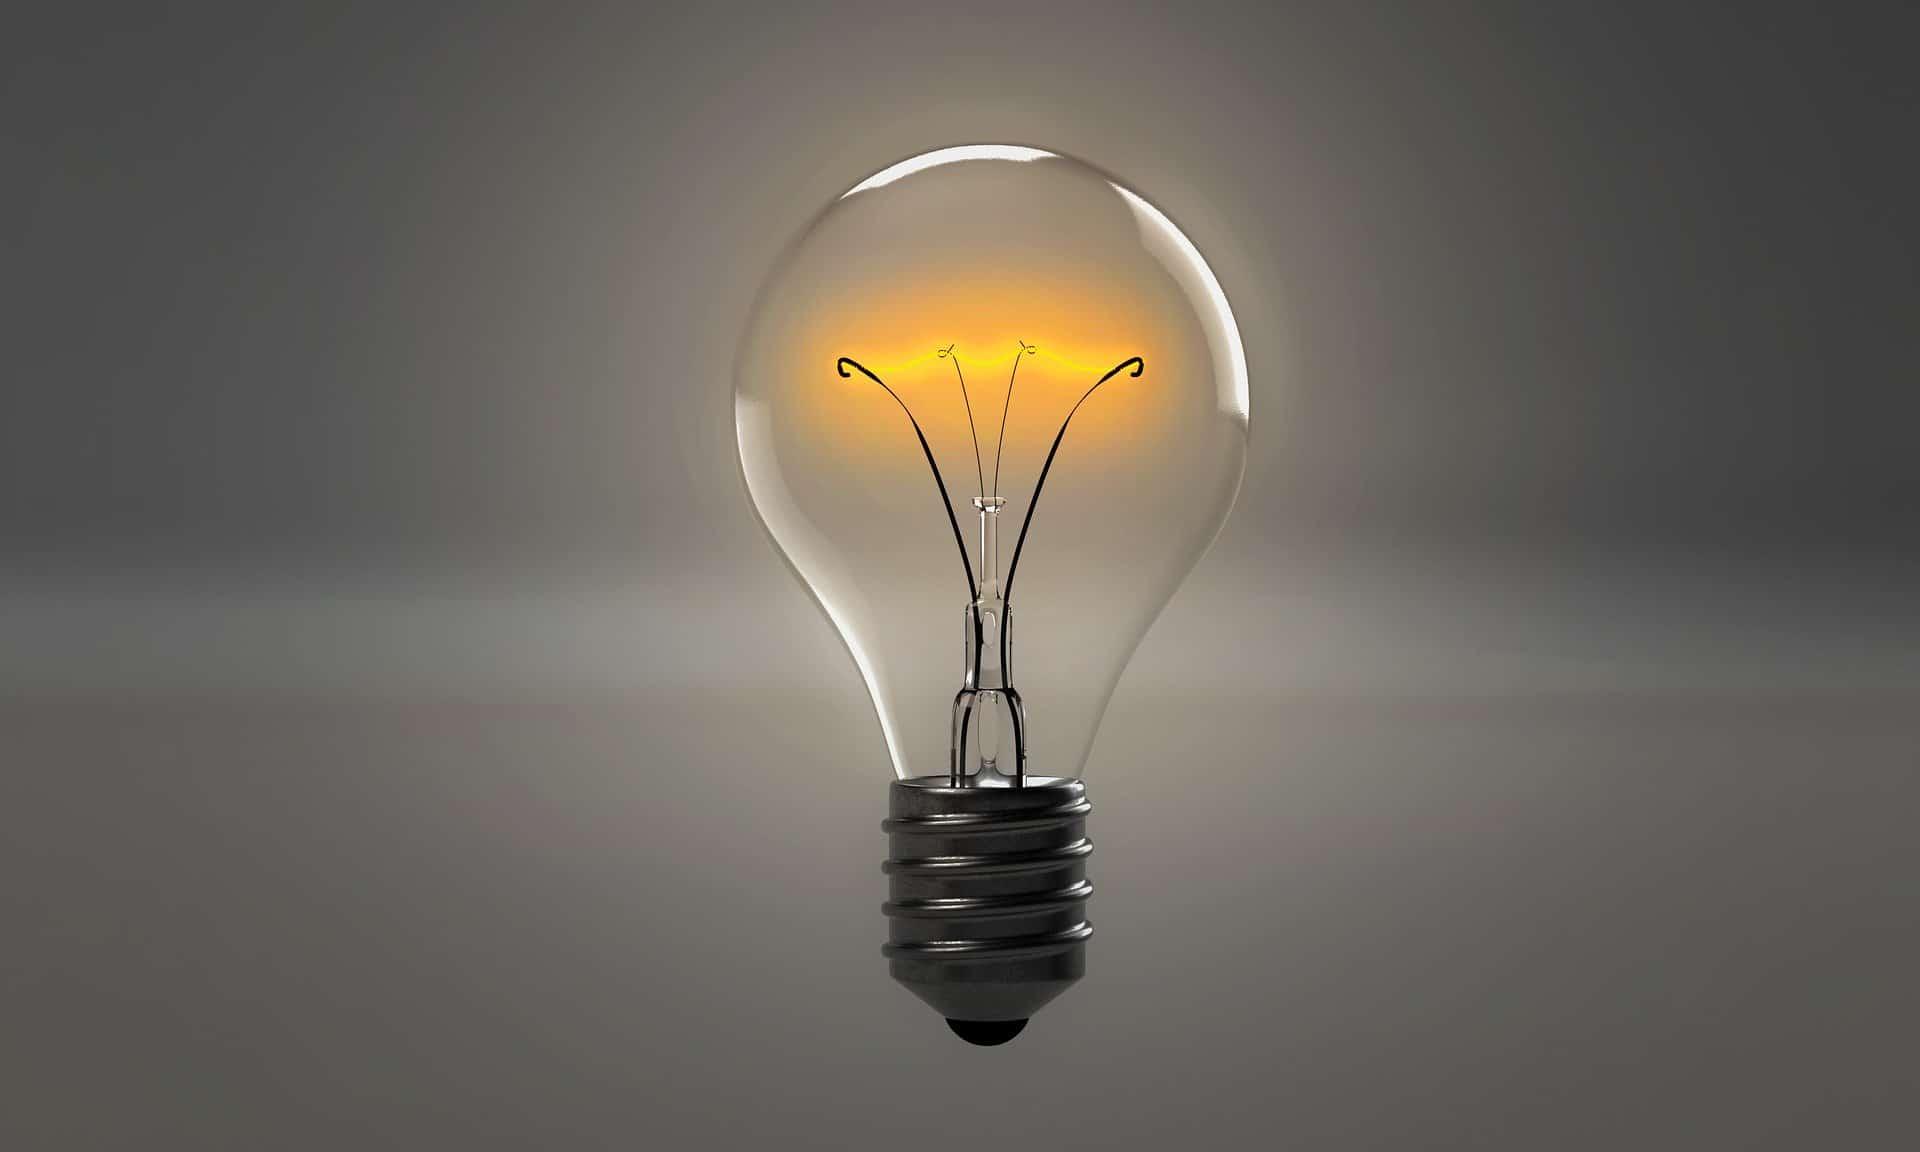 lightbulb-1875247_1920-pixabay